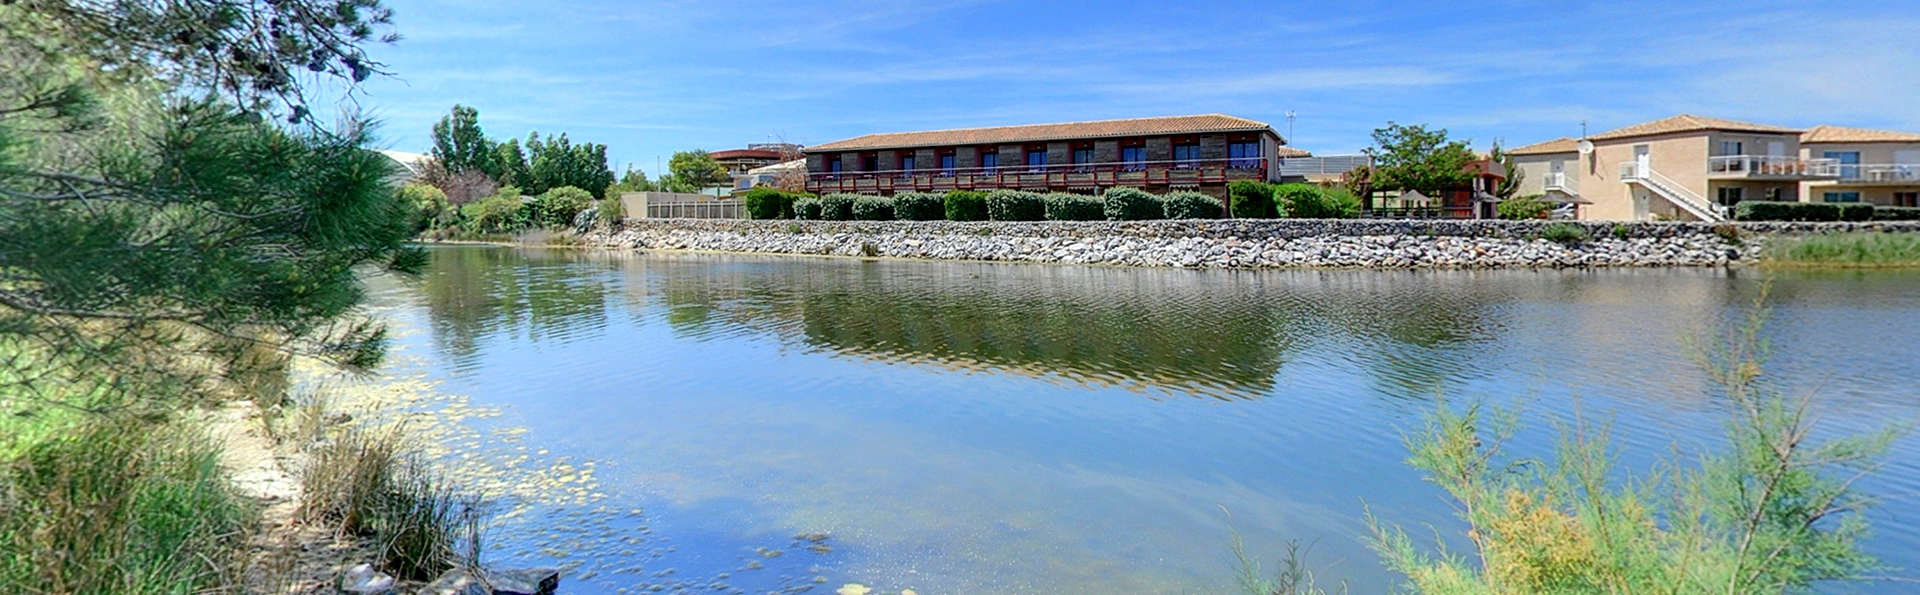 Hotel Le Phoebus Garden & Spa - Edit_Lage.jpg